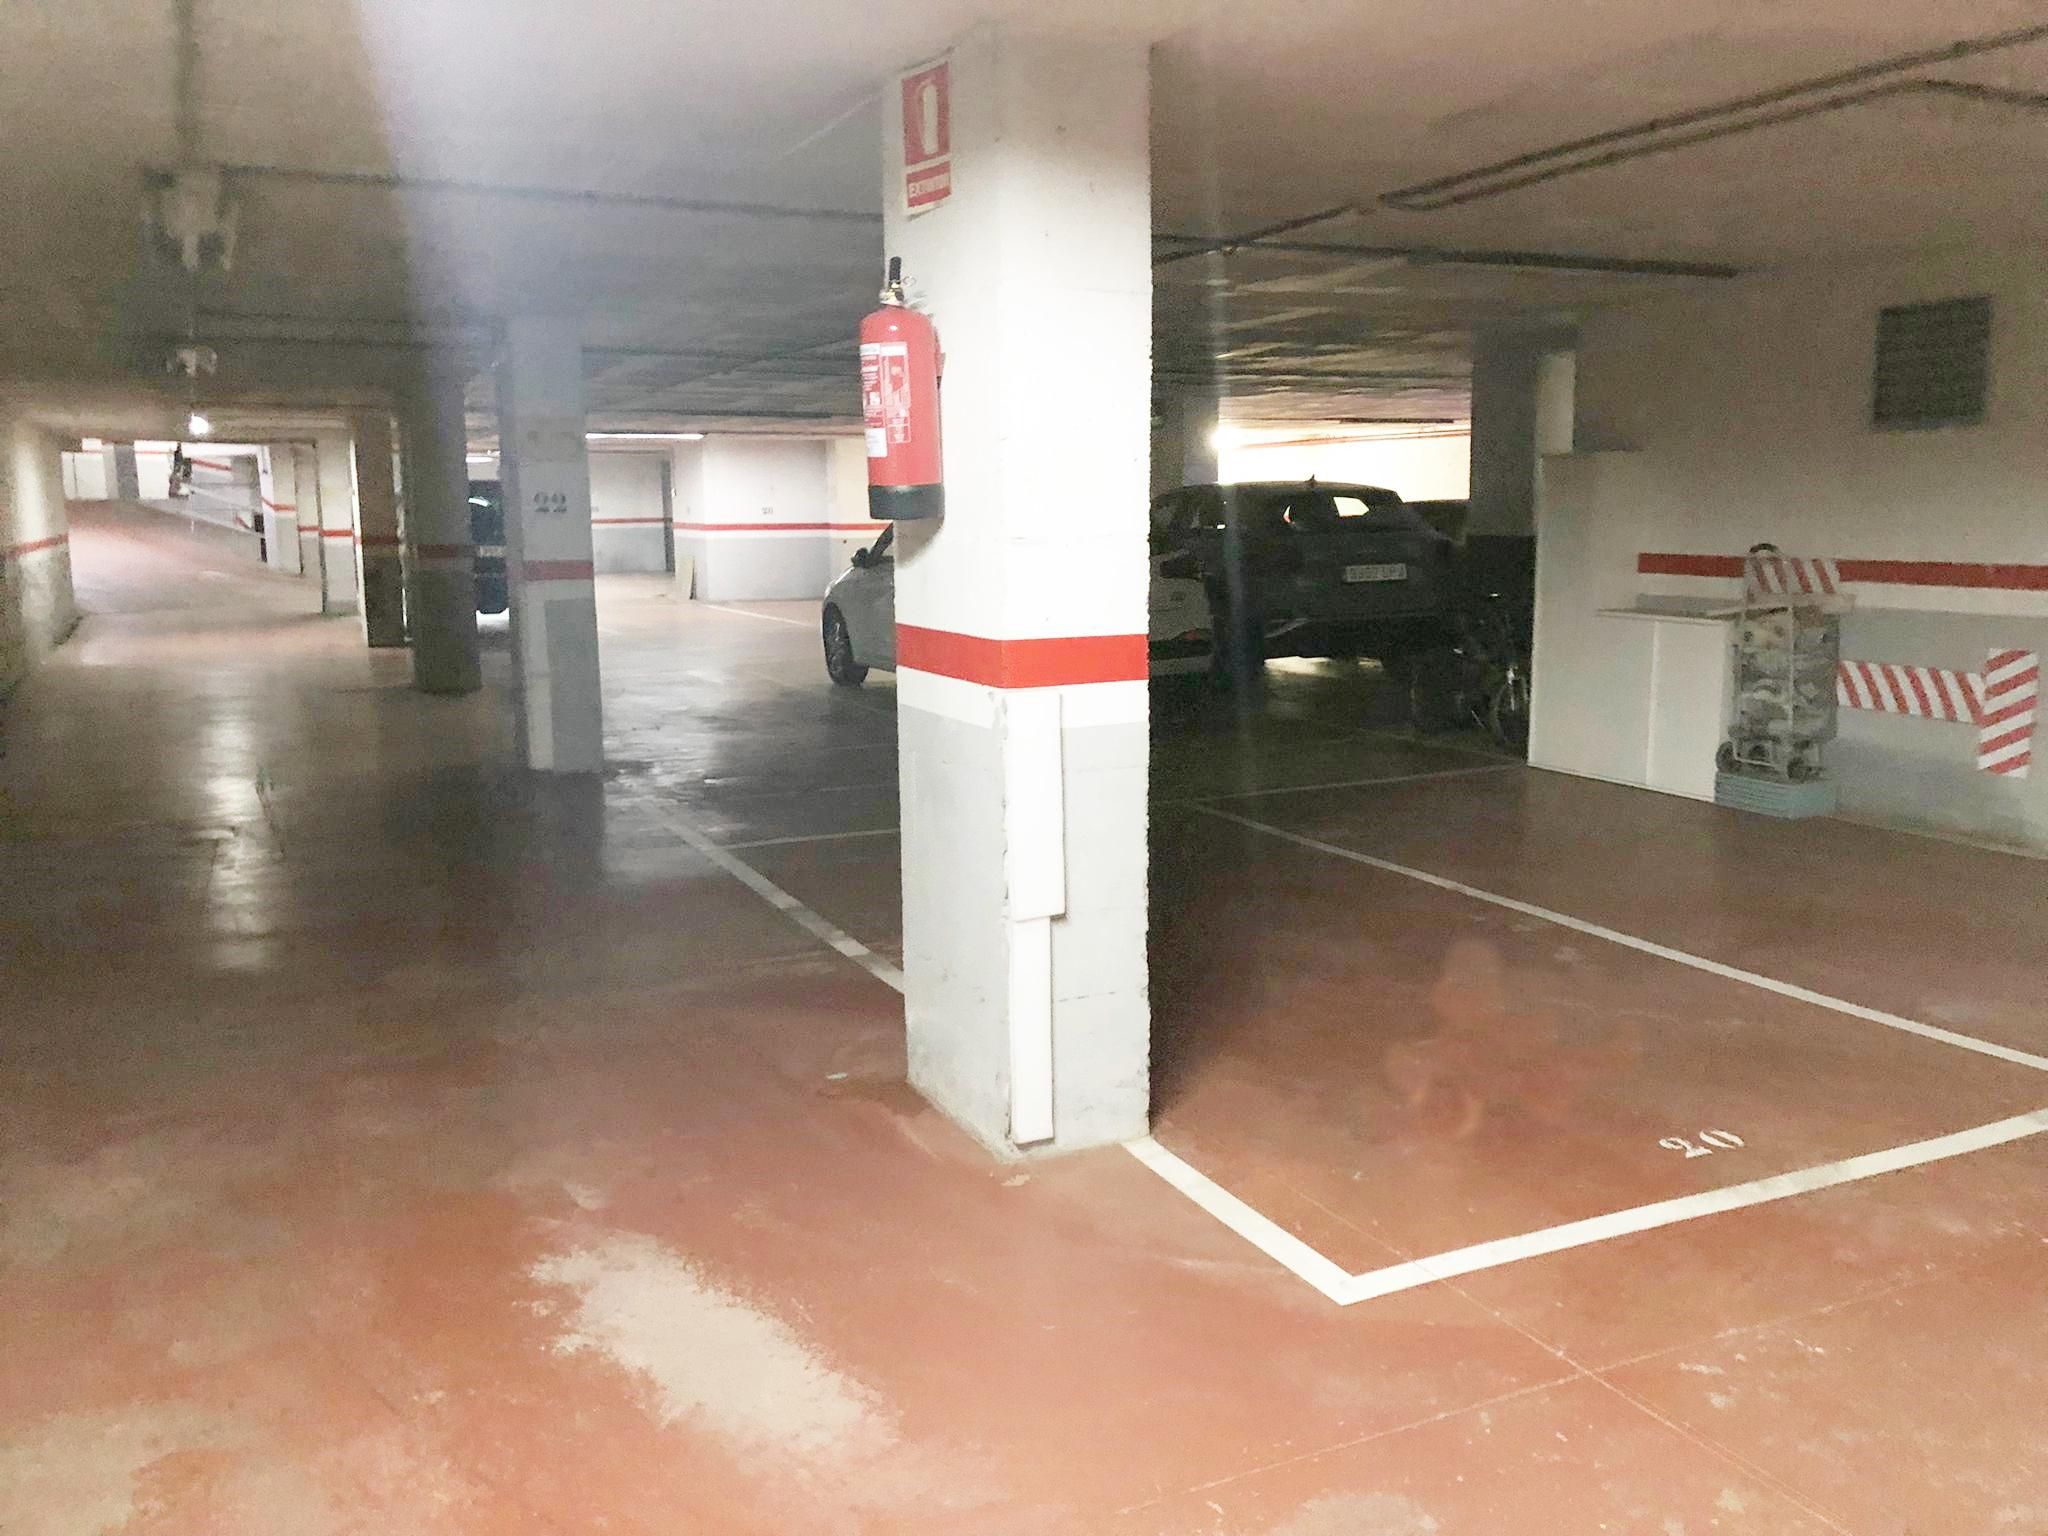 Imagen 4 Parking Coche en venta en Granollers / Calle Equador- Zona Font Verda.- Granollers